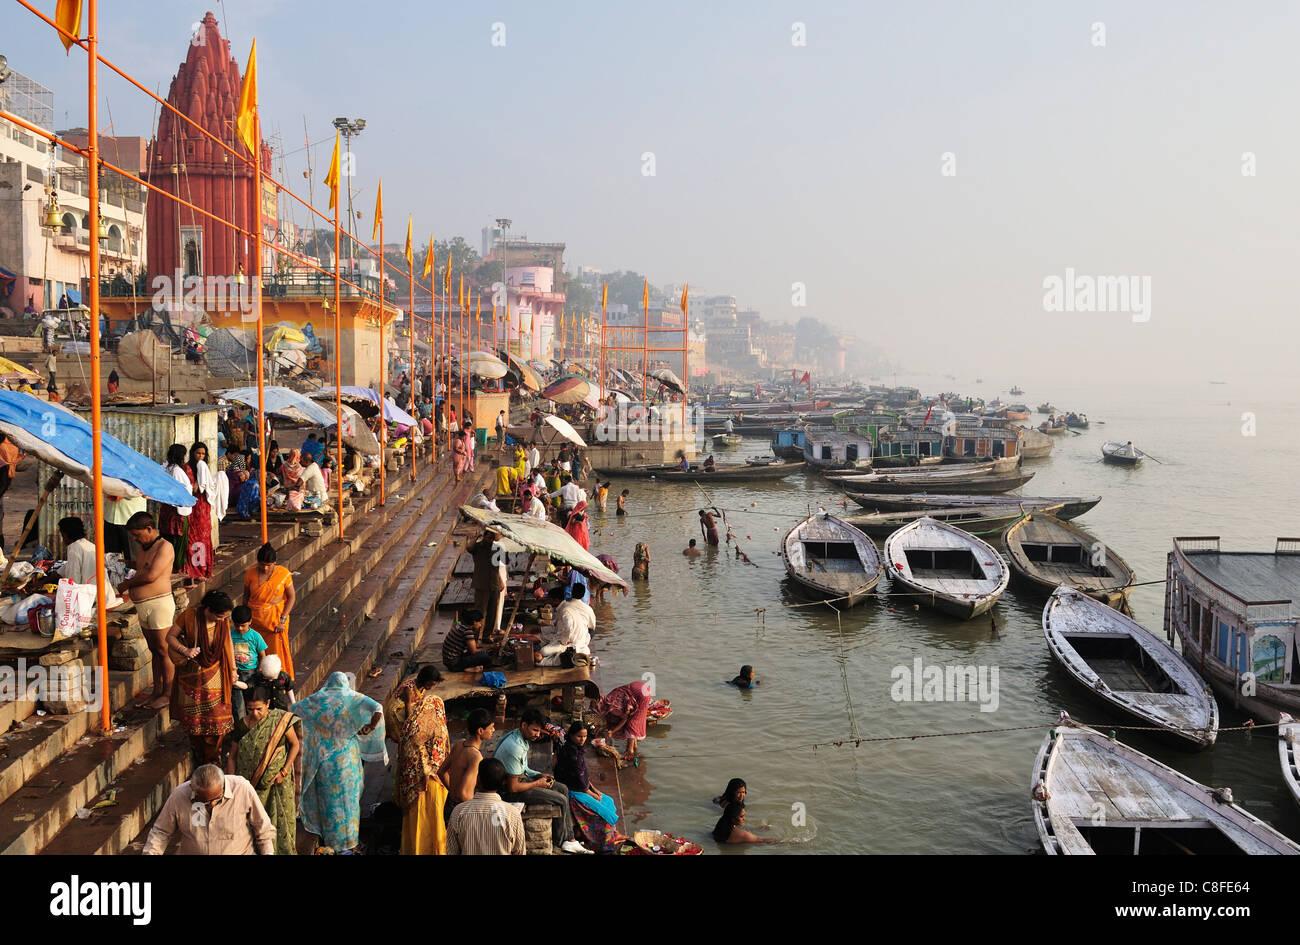 Ghats sur le Gange, Varanasi (Bénarès, Uttar Pradesh, Inde Photo Stock